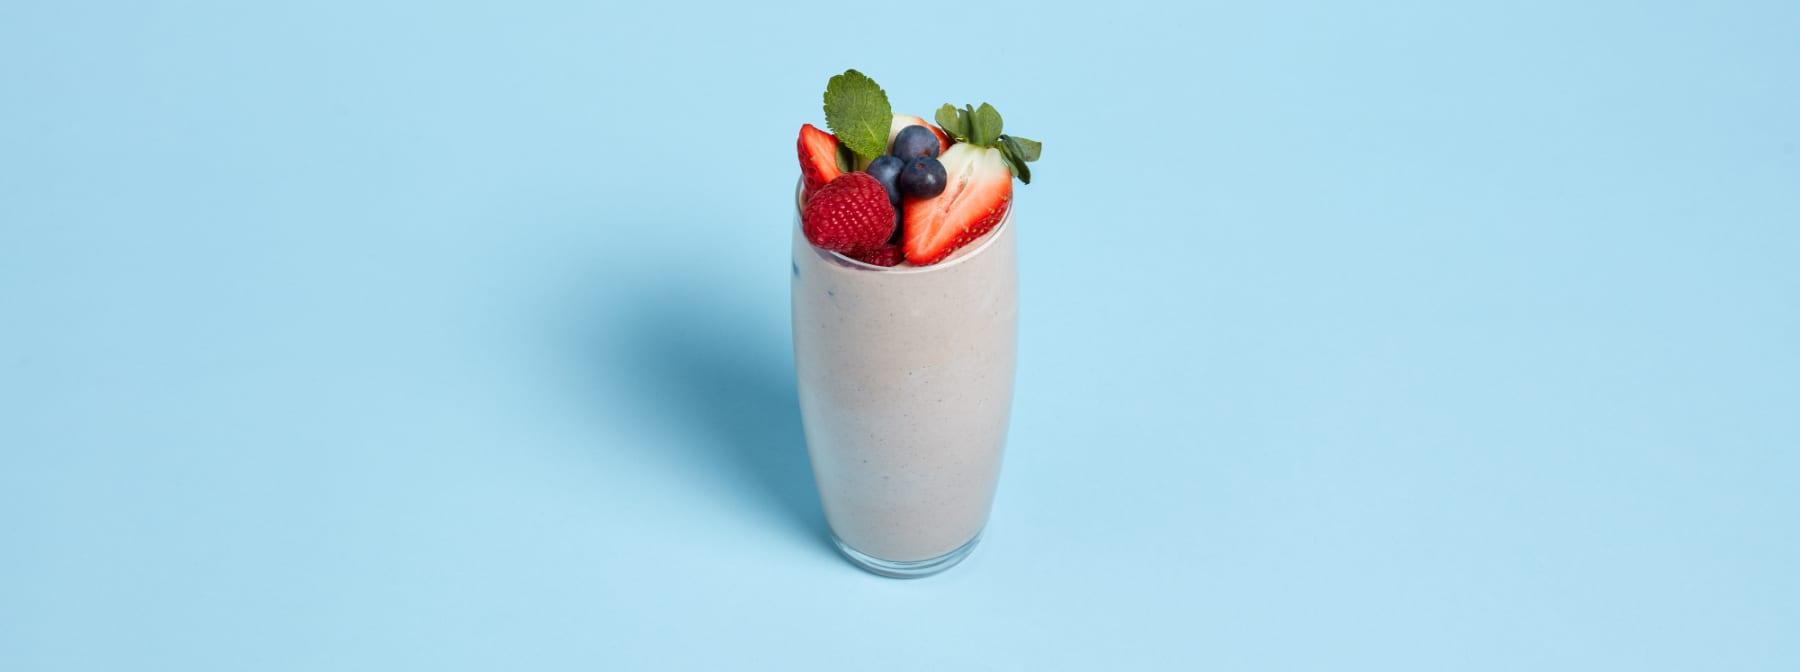 Vegan Protein Smoothie | The Best Vegan Shake Recipe